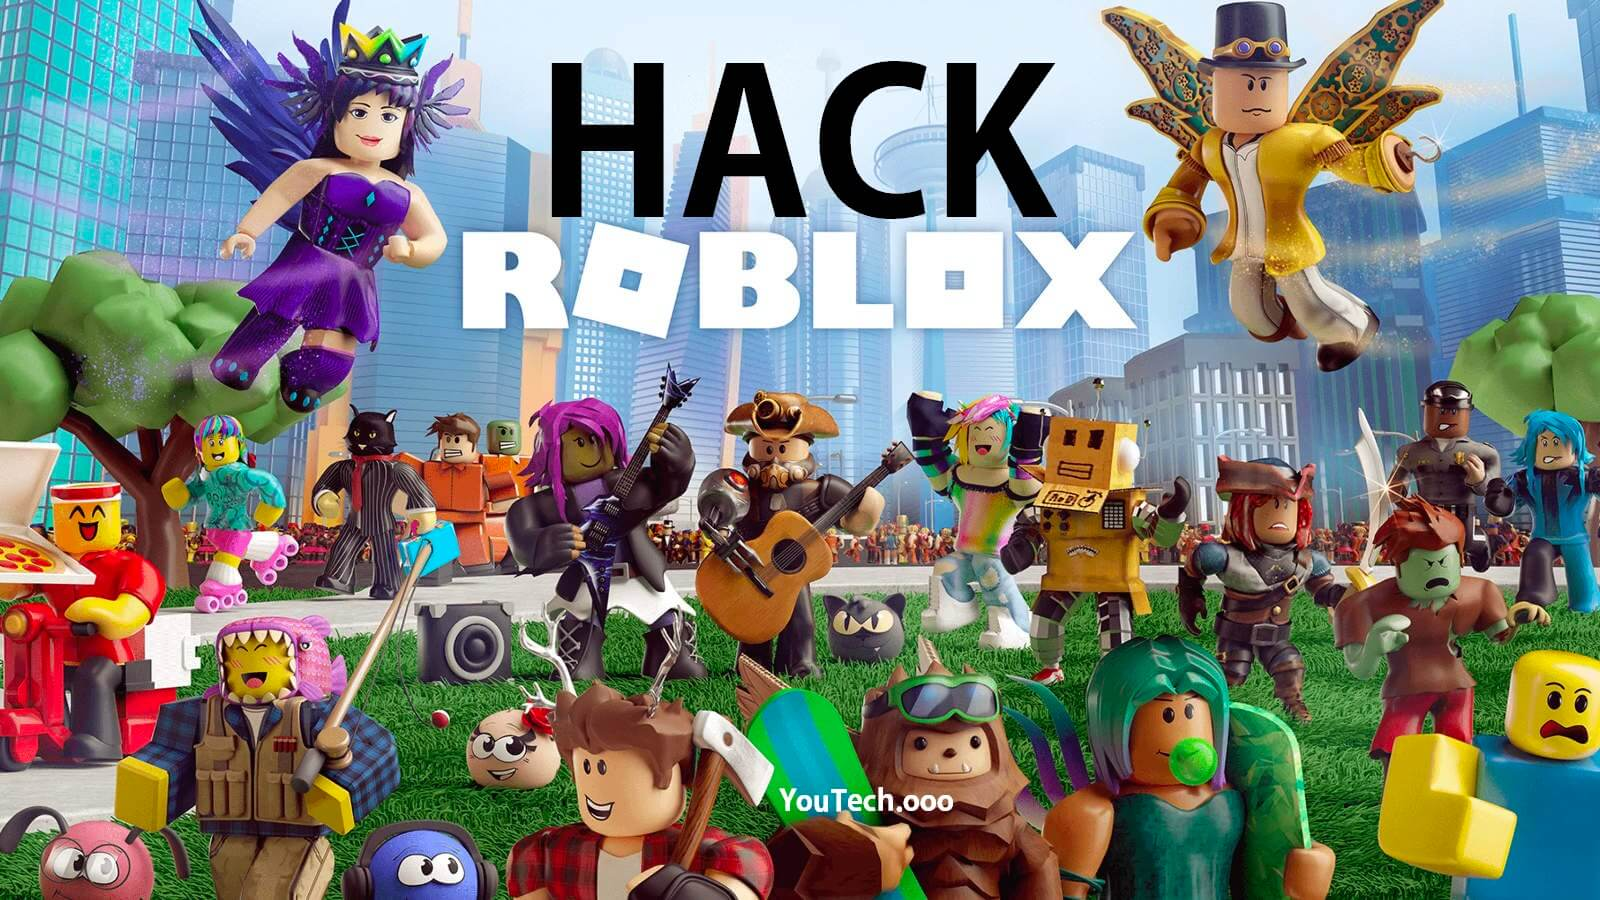 Roblox Hack Aimbots Mod Menus Wallhacks And Cheats - Roblox Hacks Aimbot Wallhack Free Robux And Roblox Mods